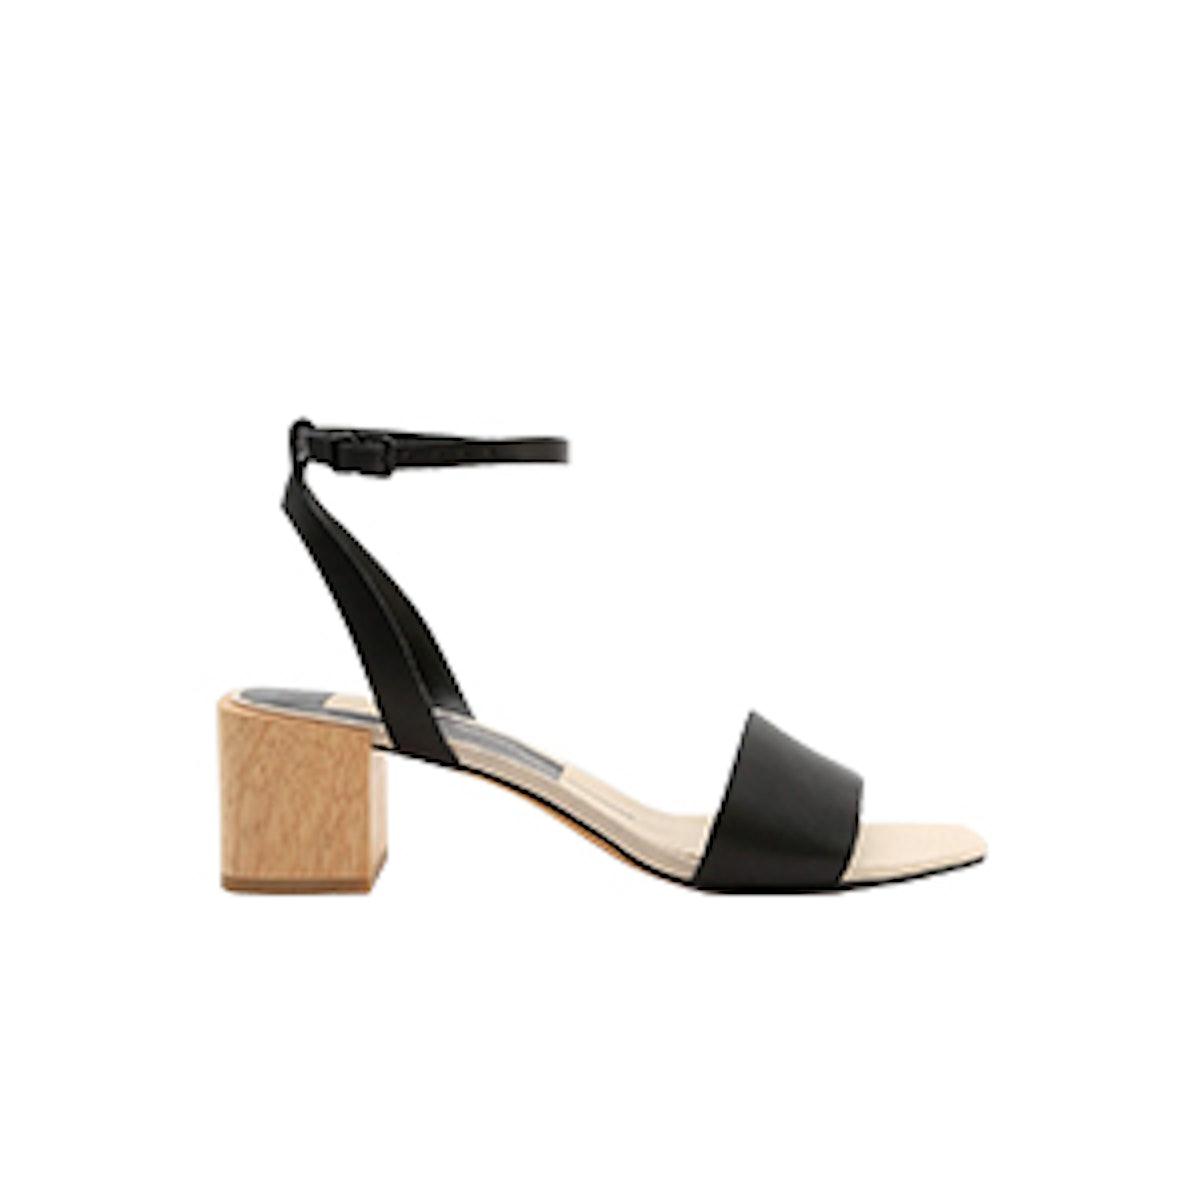 Zarita Sandals